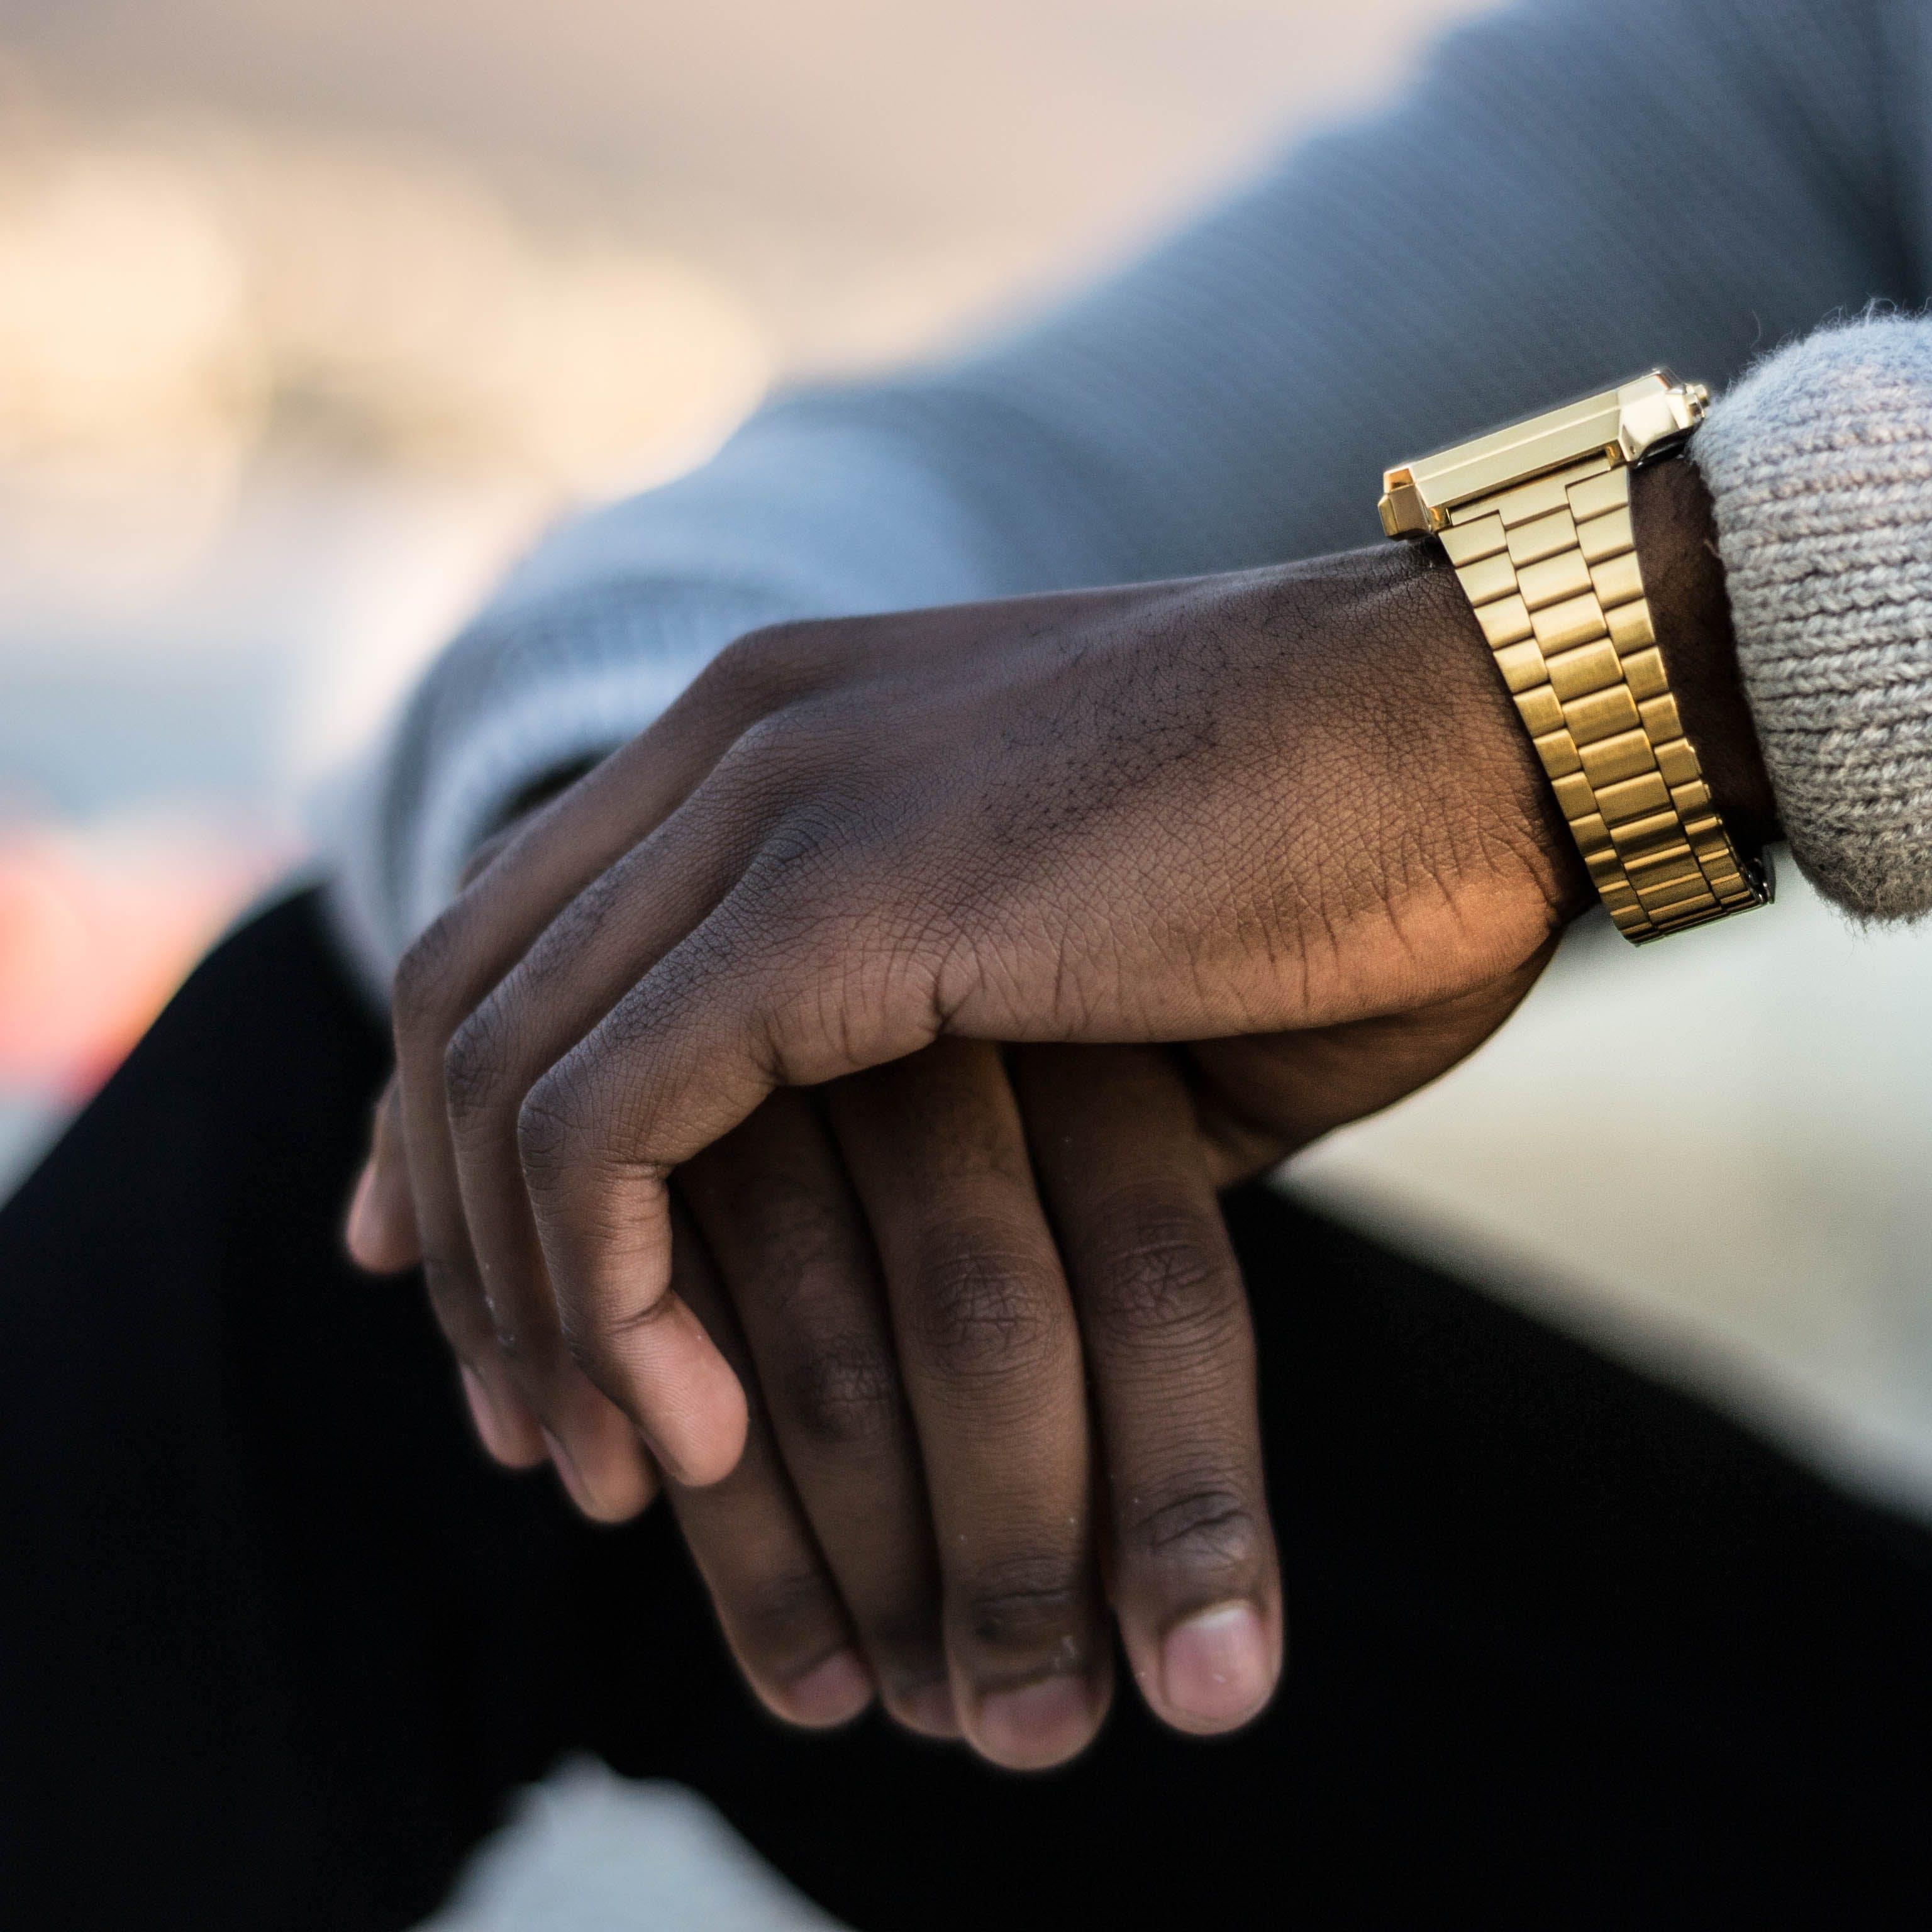 Man Wearing Gold-colored Wristwatch